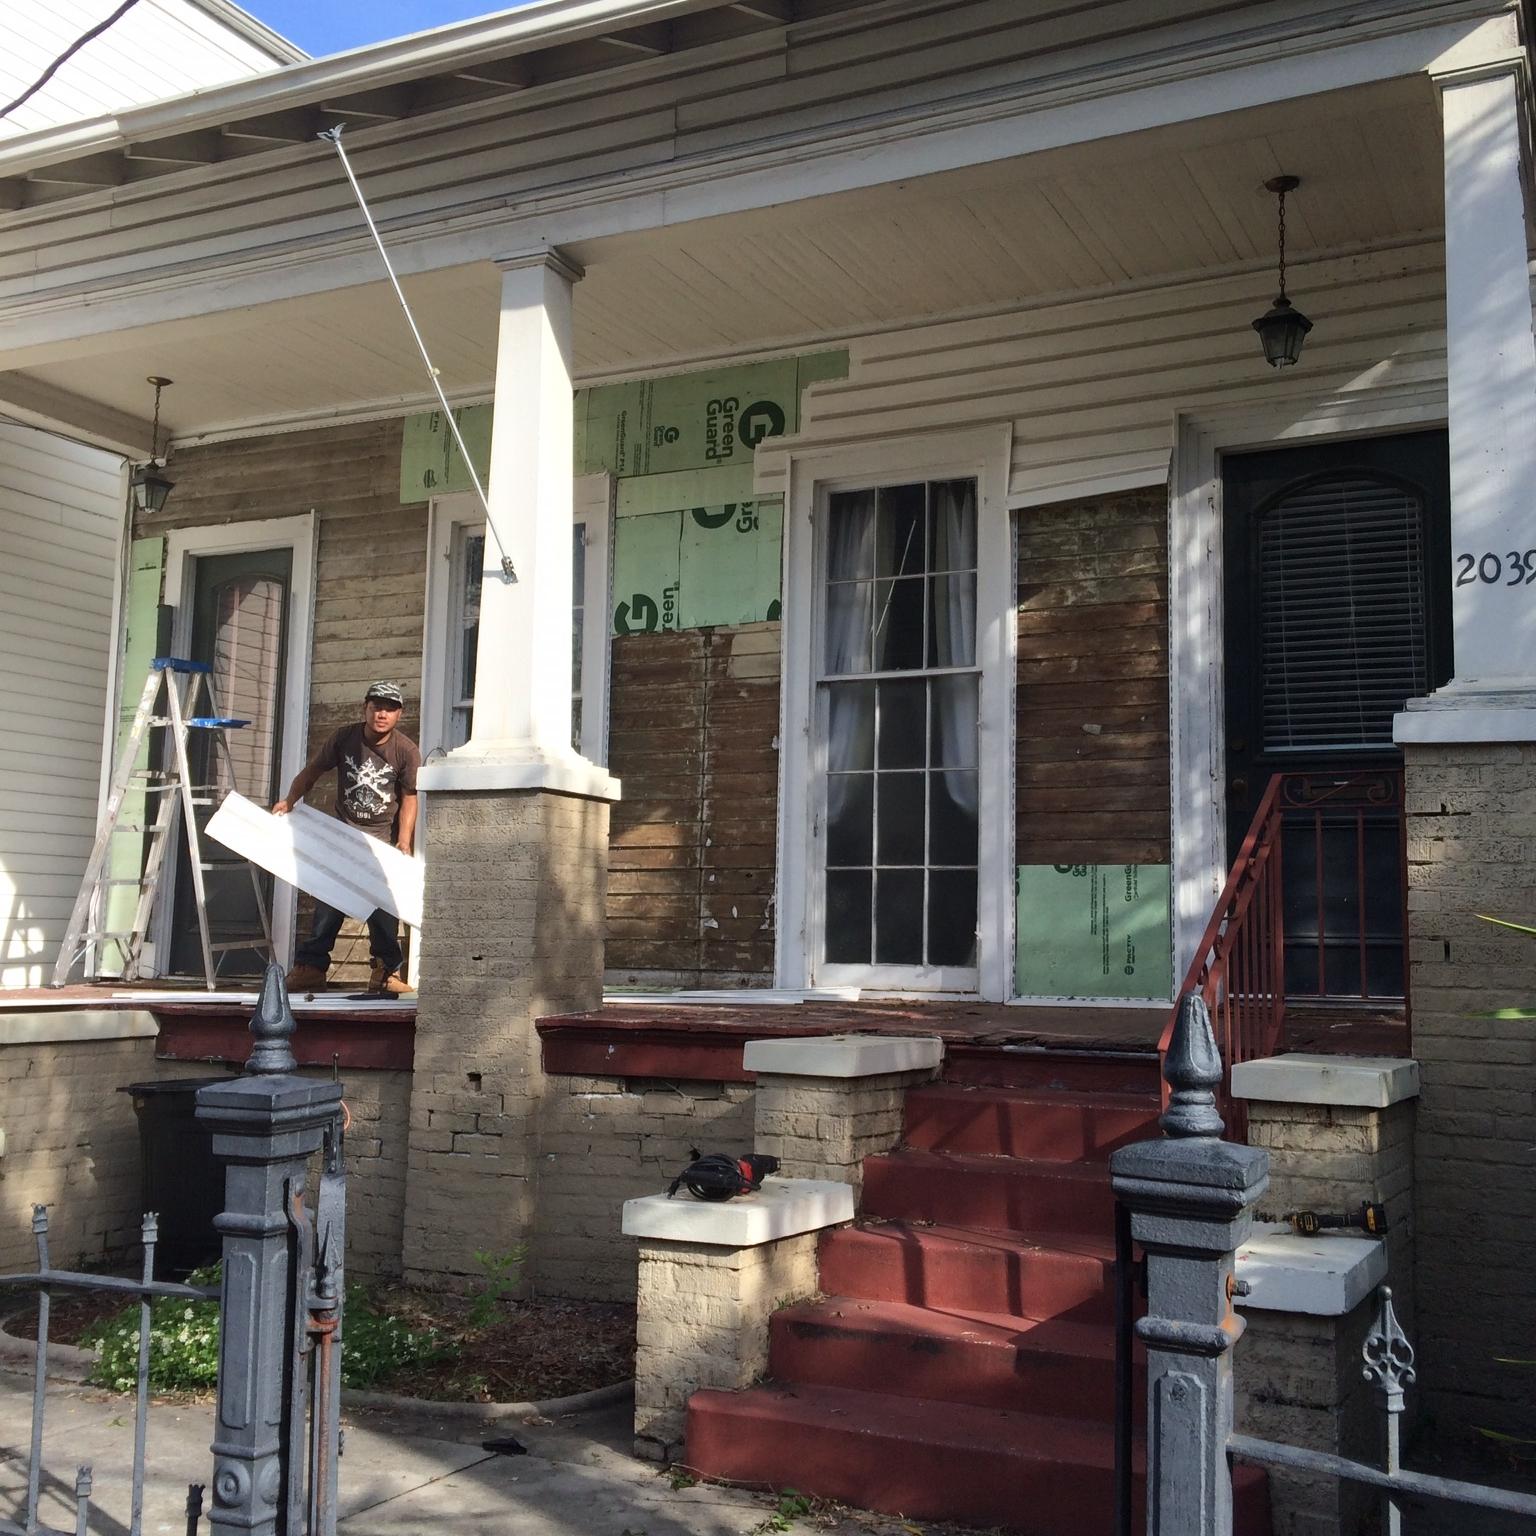 Exterior renovation begins